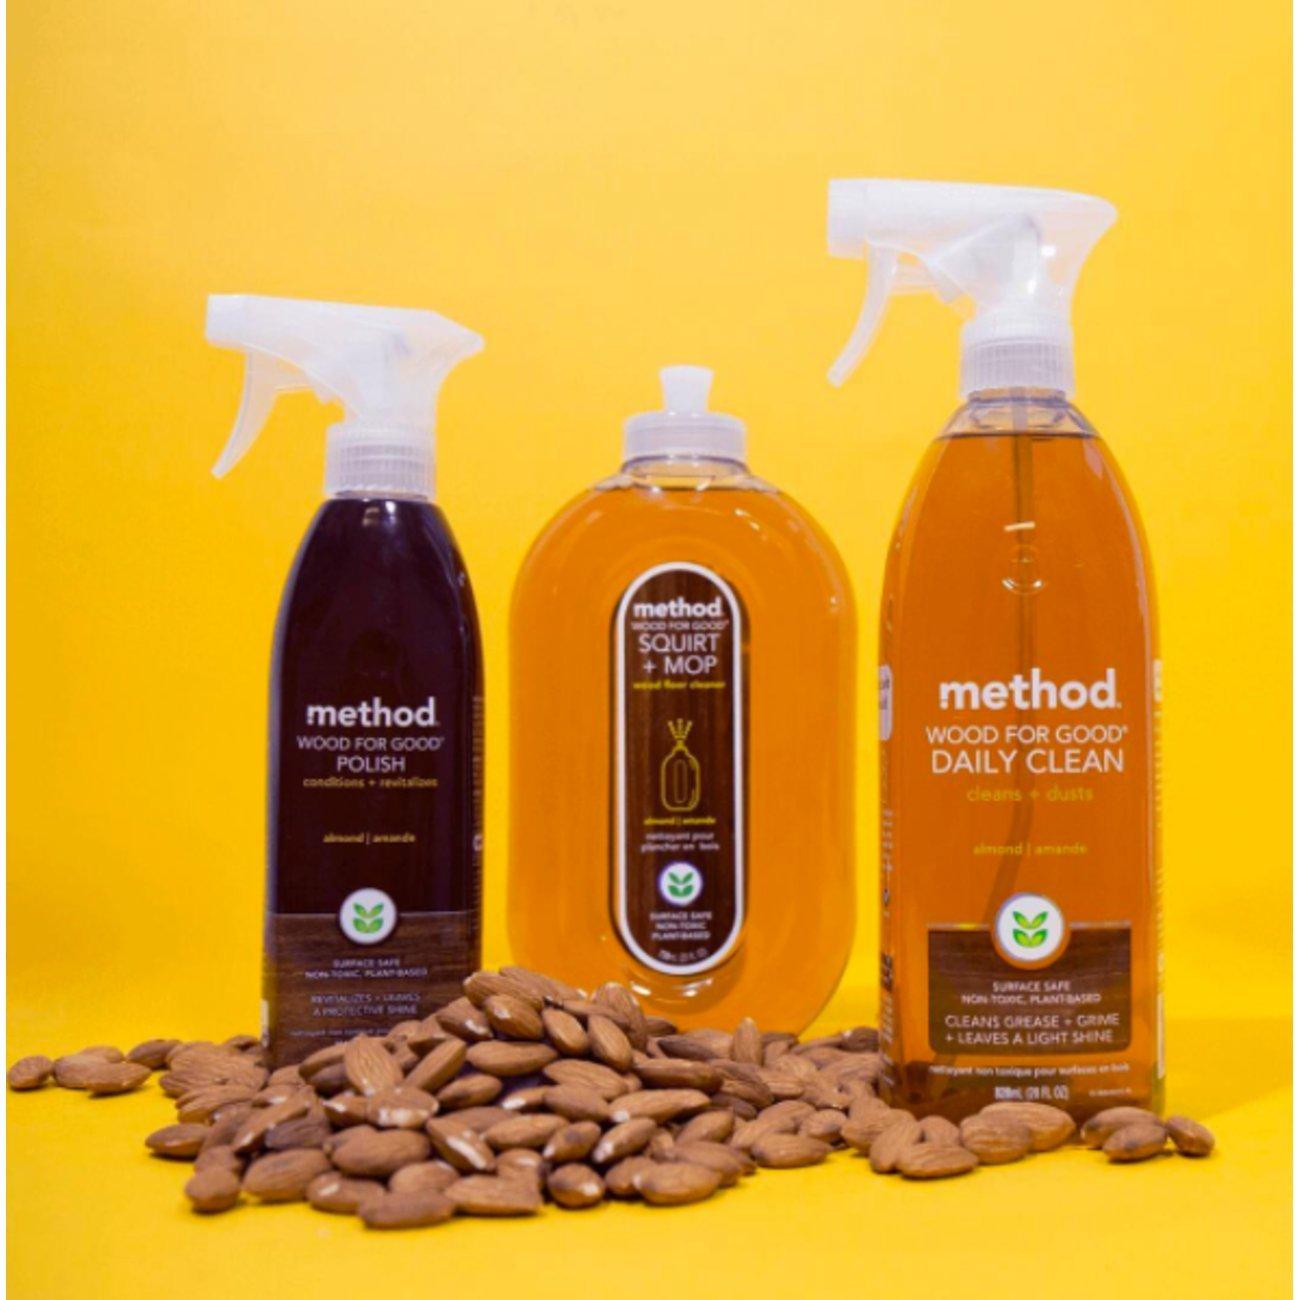 Method Squirt + Mop Hardwood Floor Cleaner, Almond, 25 Ounce (Pack 6) by Method (Image #5)